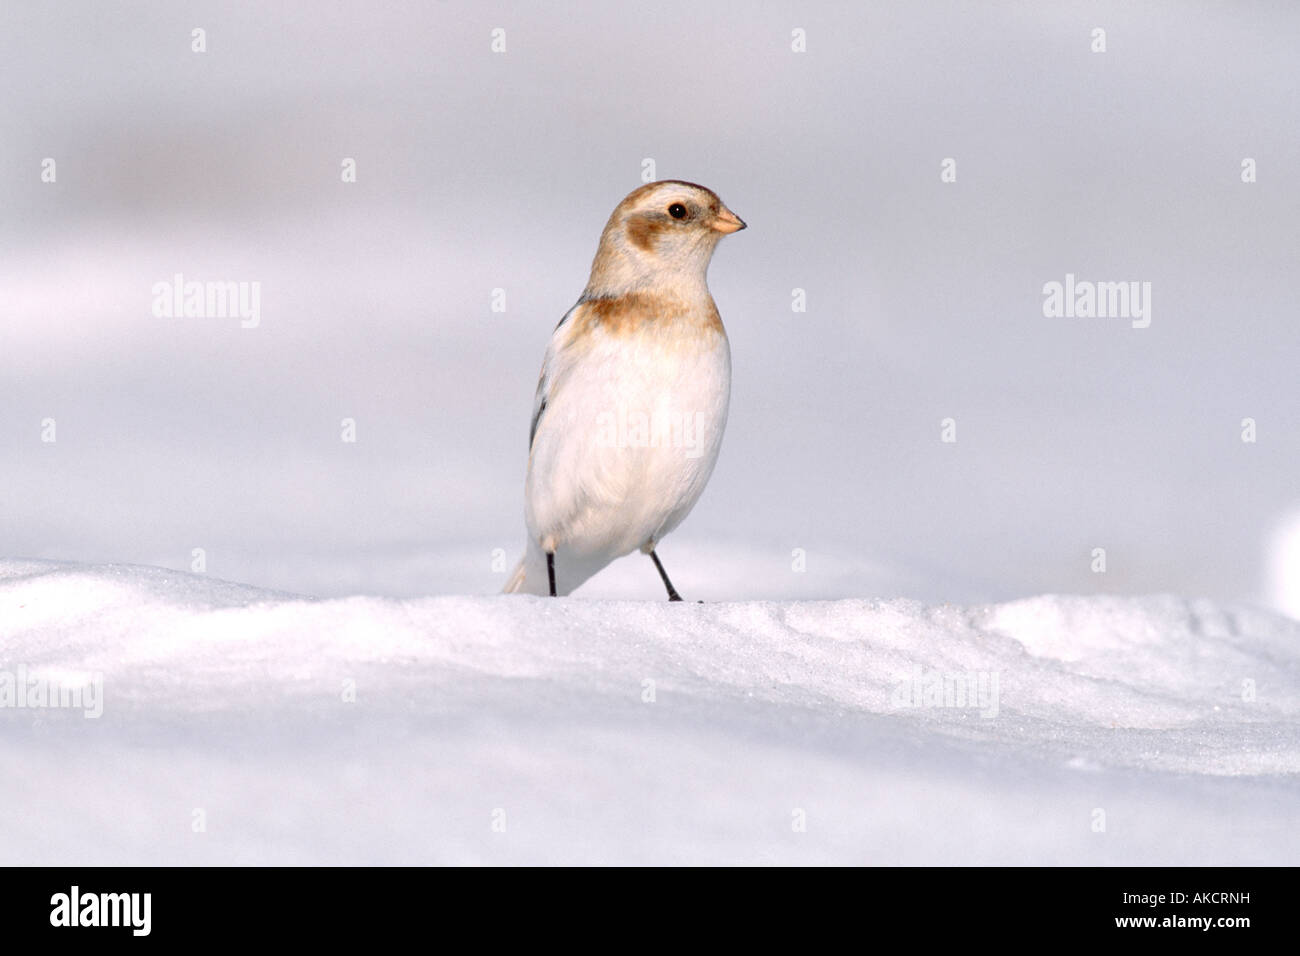 Snow Bunting - Stock Image